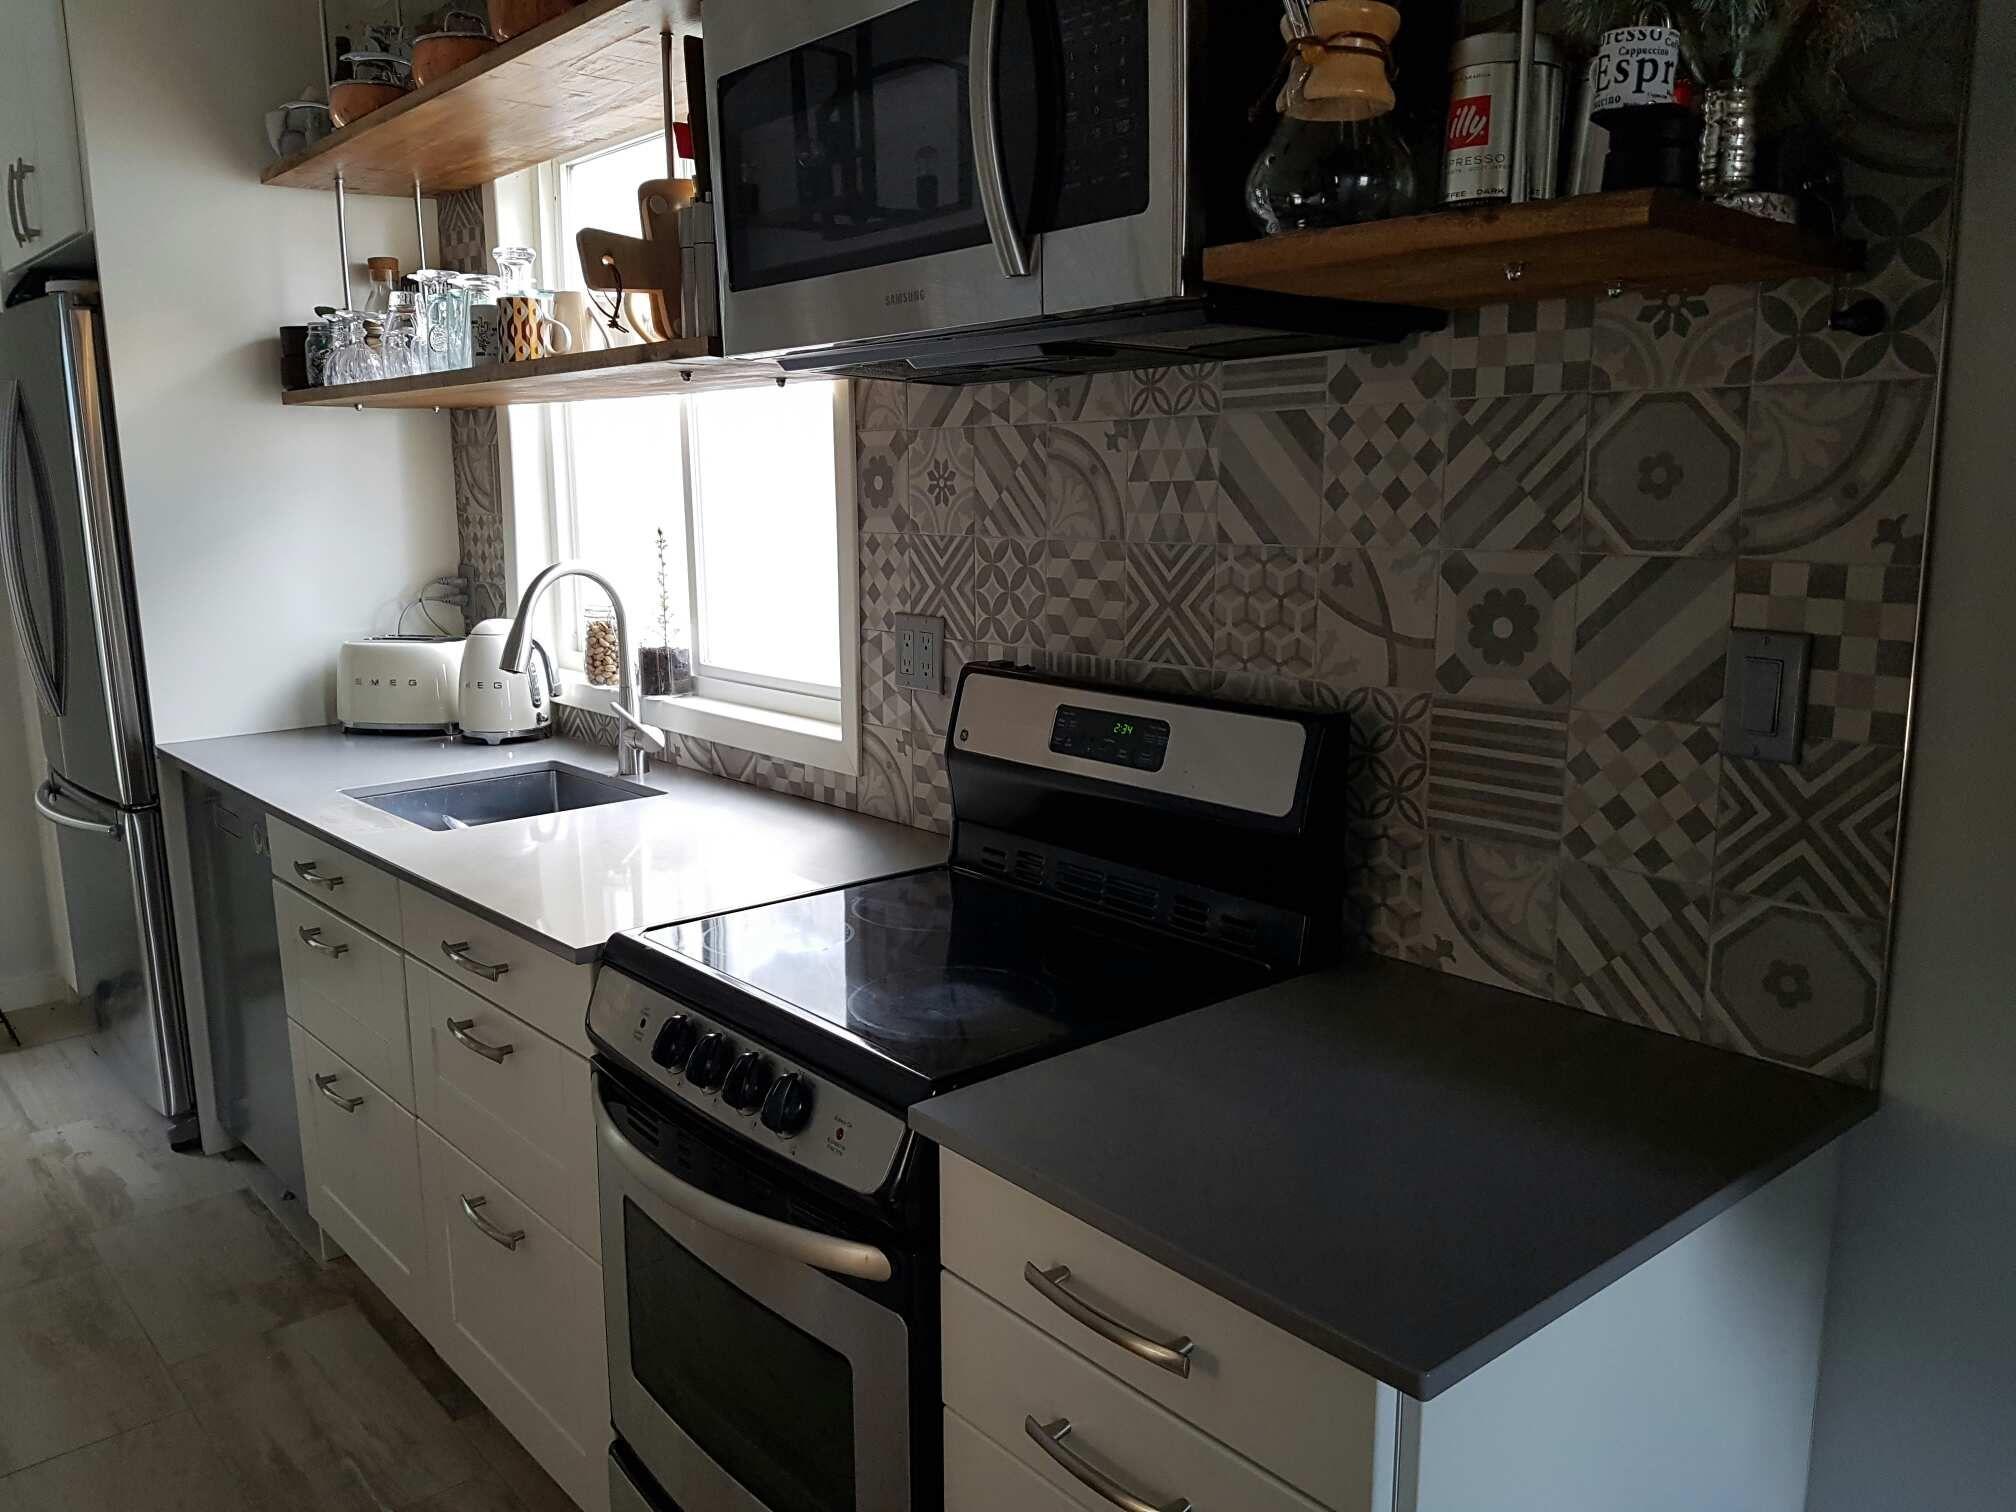 6x6 porcelain tile backsplash mosaic kitchen reno 6x6 porcelain tile backsplash mosaic kitchen reno kitchenreno doublecrazyfo Image collections